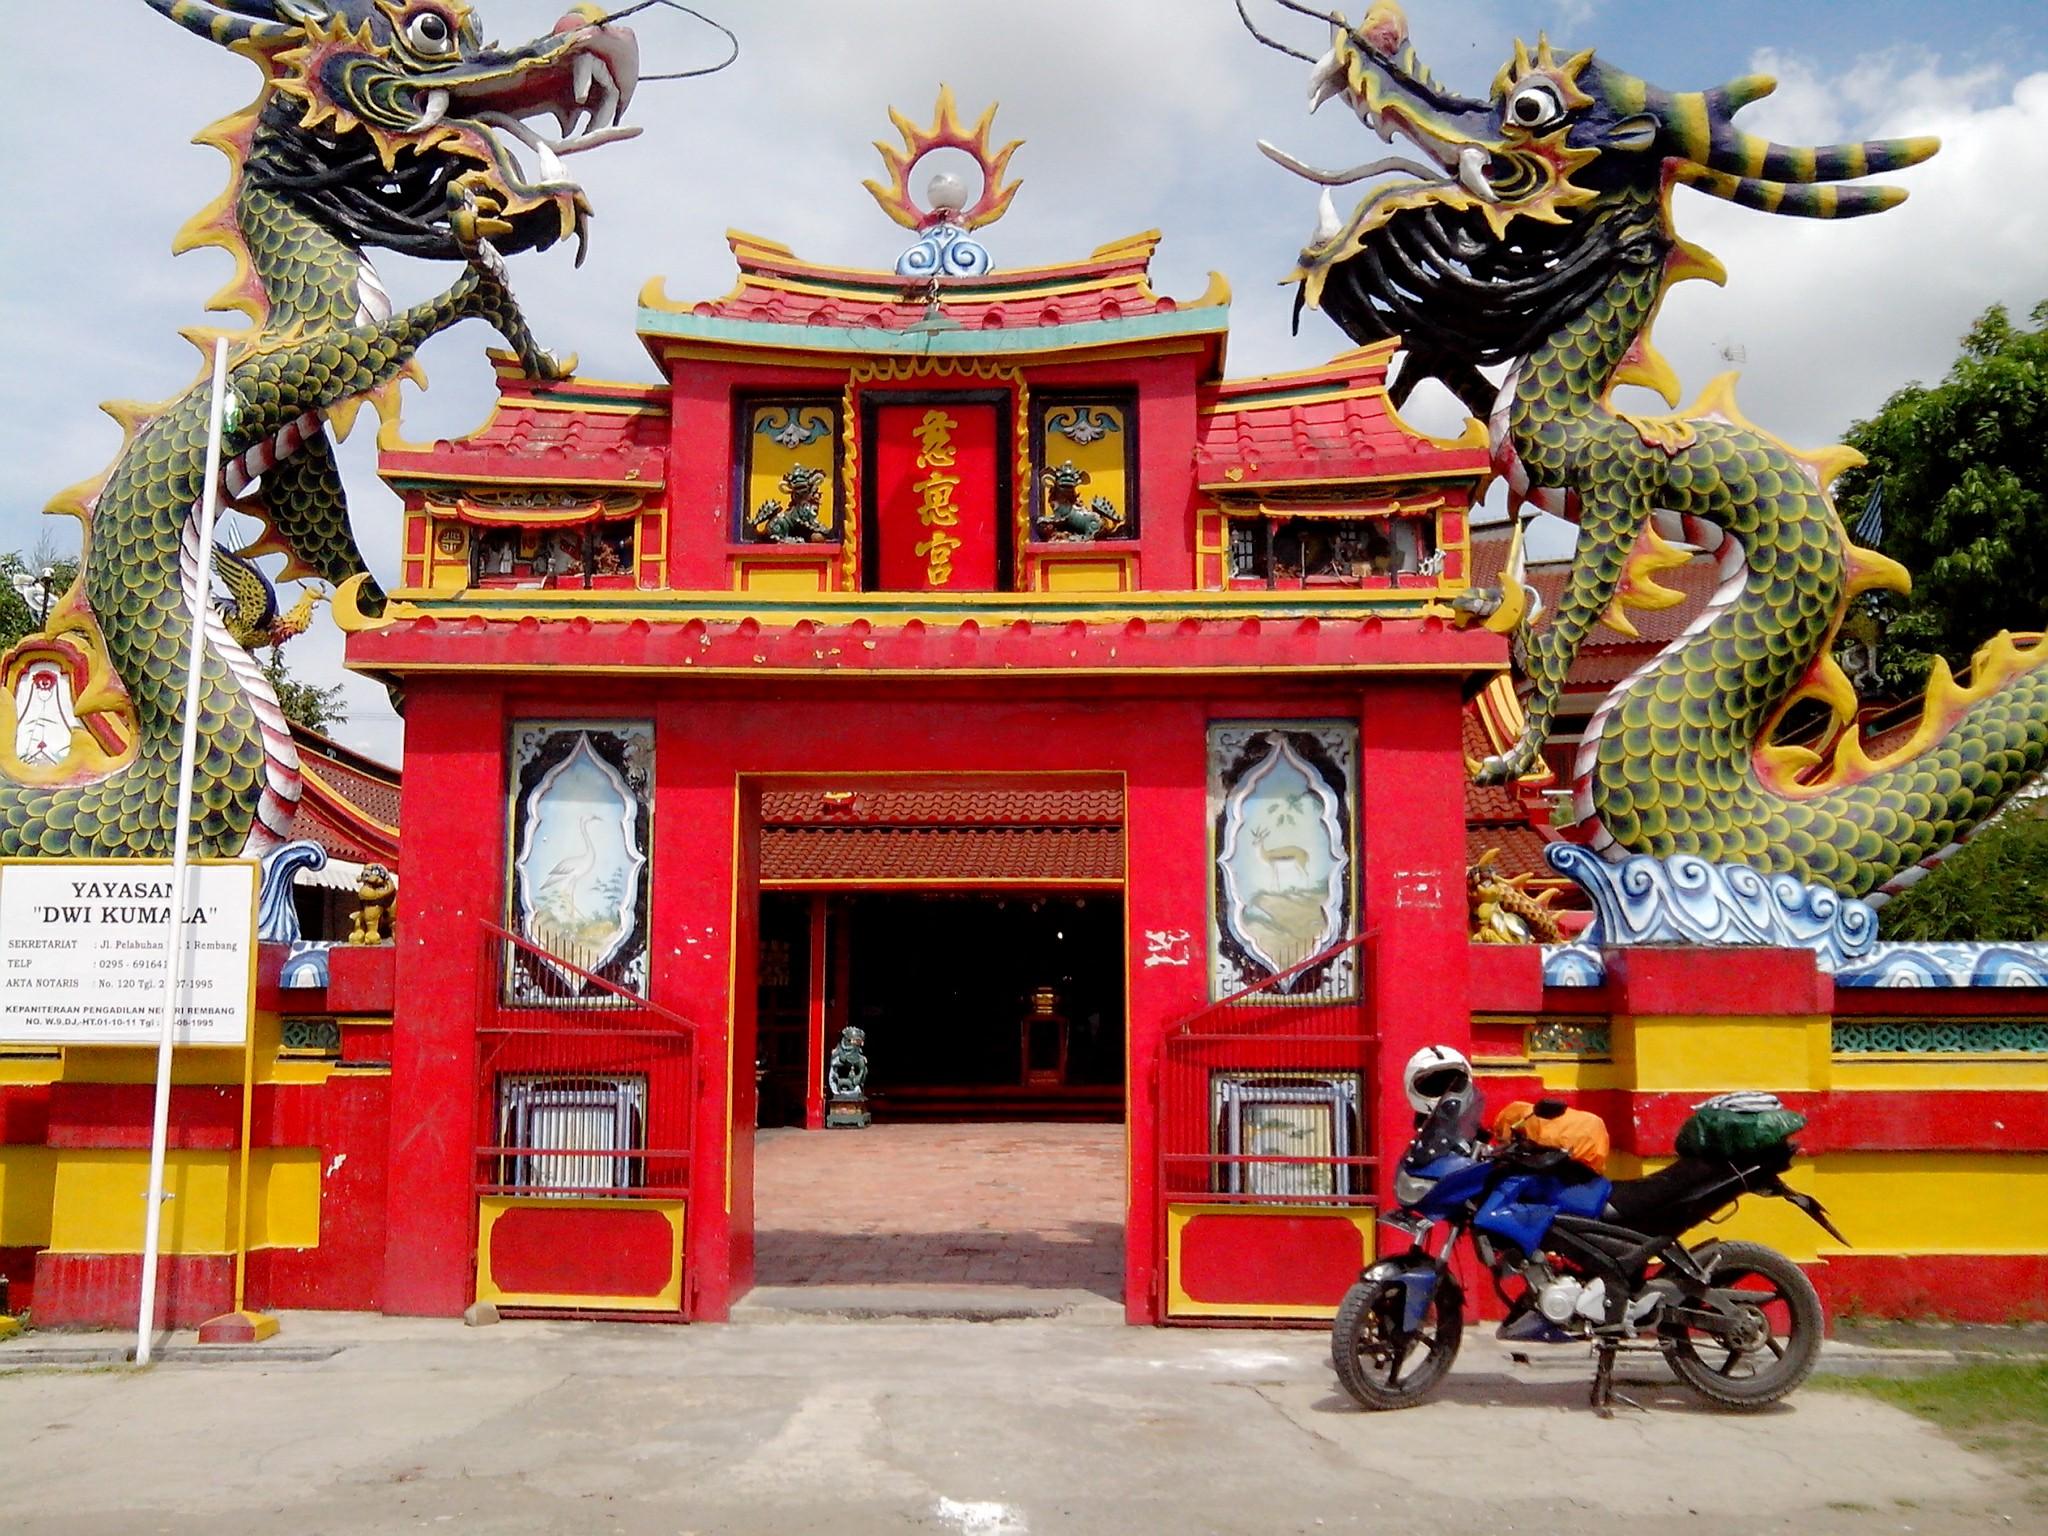 City Inspiride Wisata Rembang 28 Klenteng Mak Tjoe Hwie Kiong